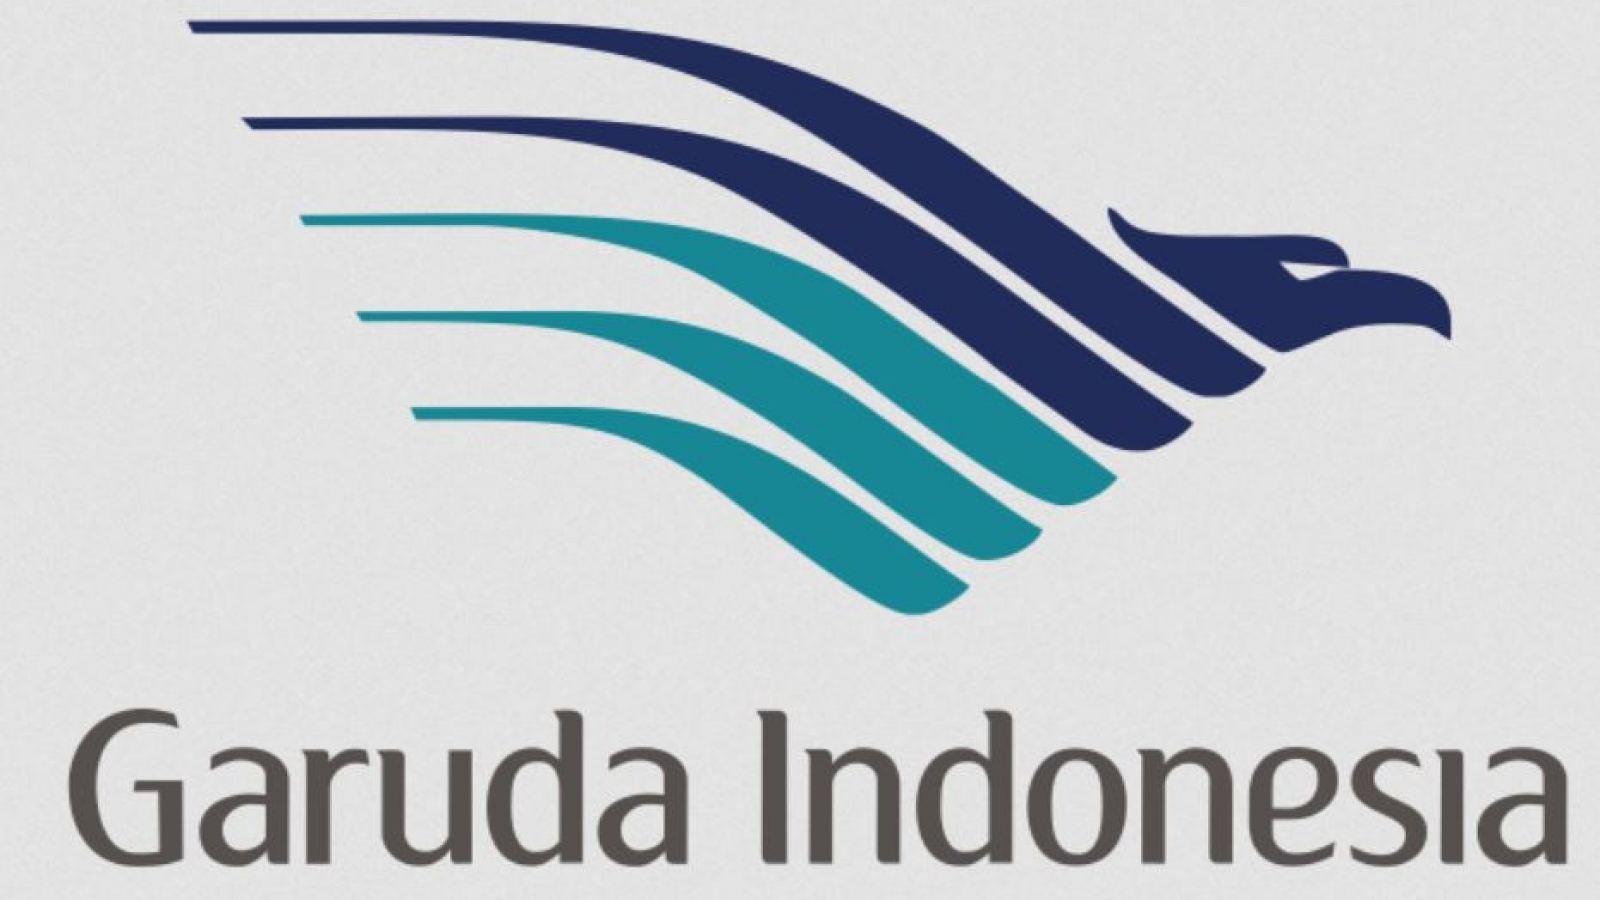 garuda_indonesia-lblia